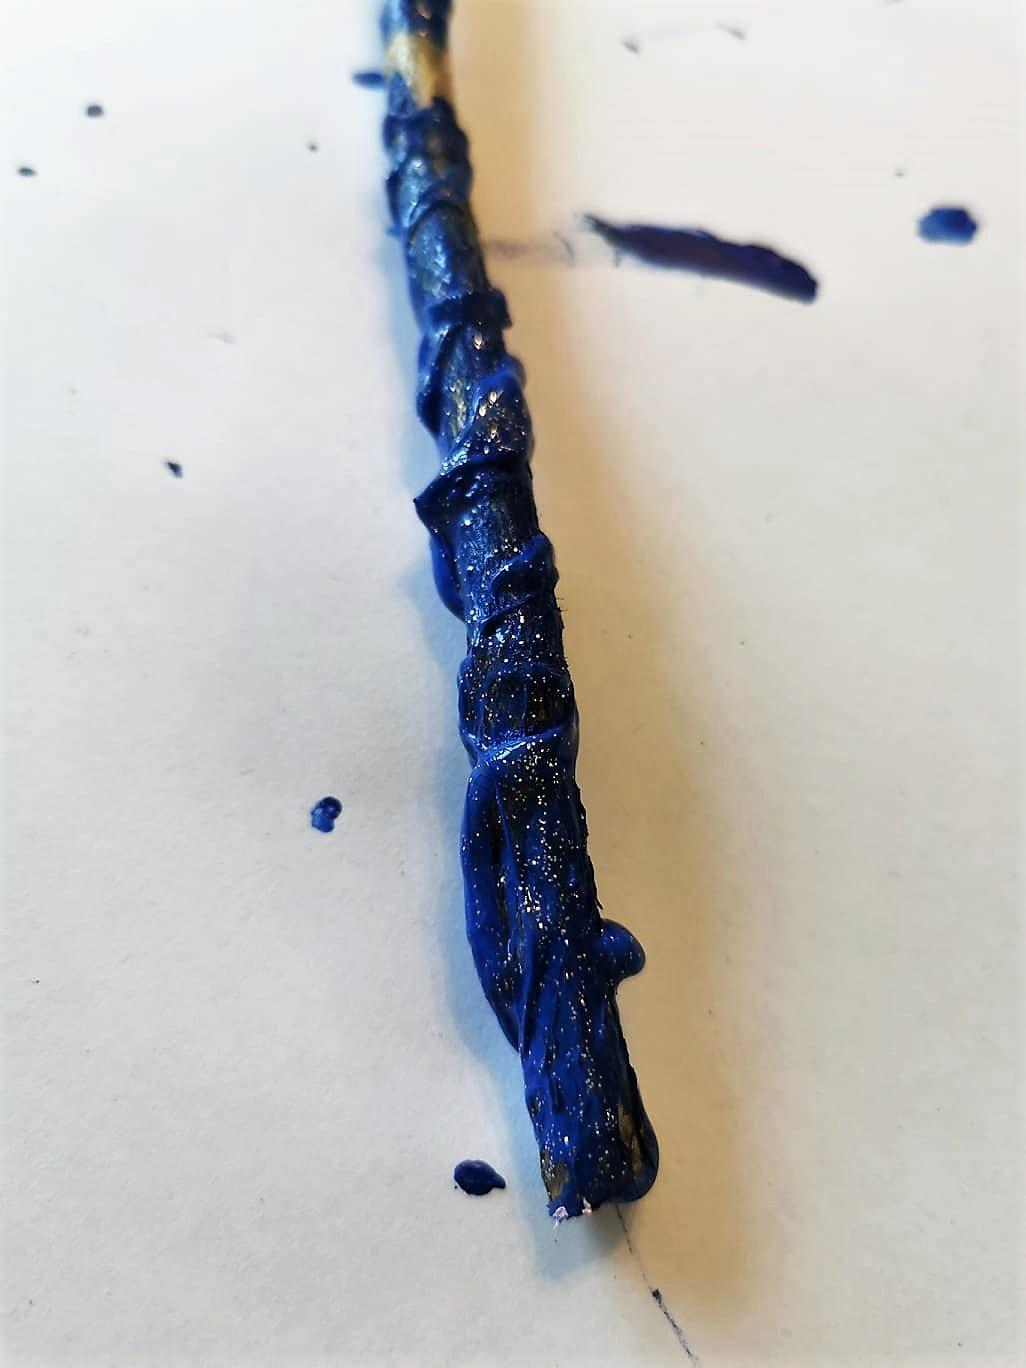 Zauberstab DIY mit Acrylfarbe und Heißkleber